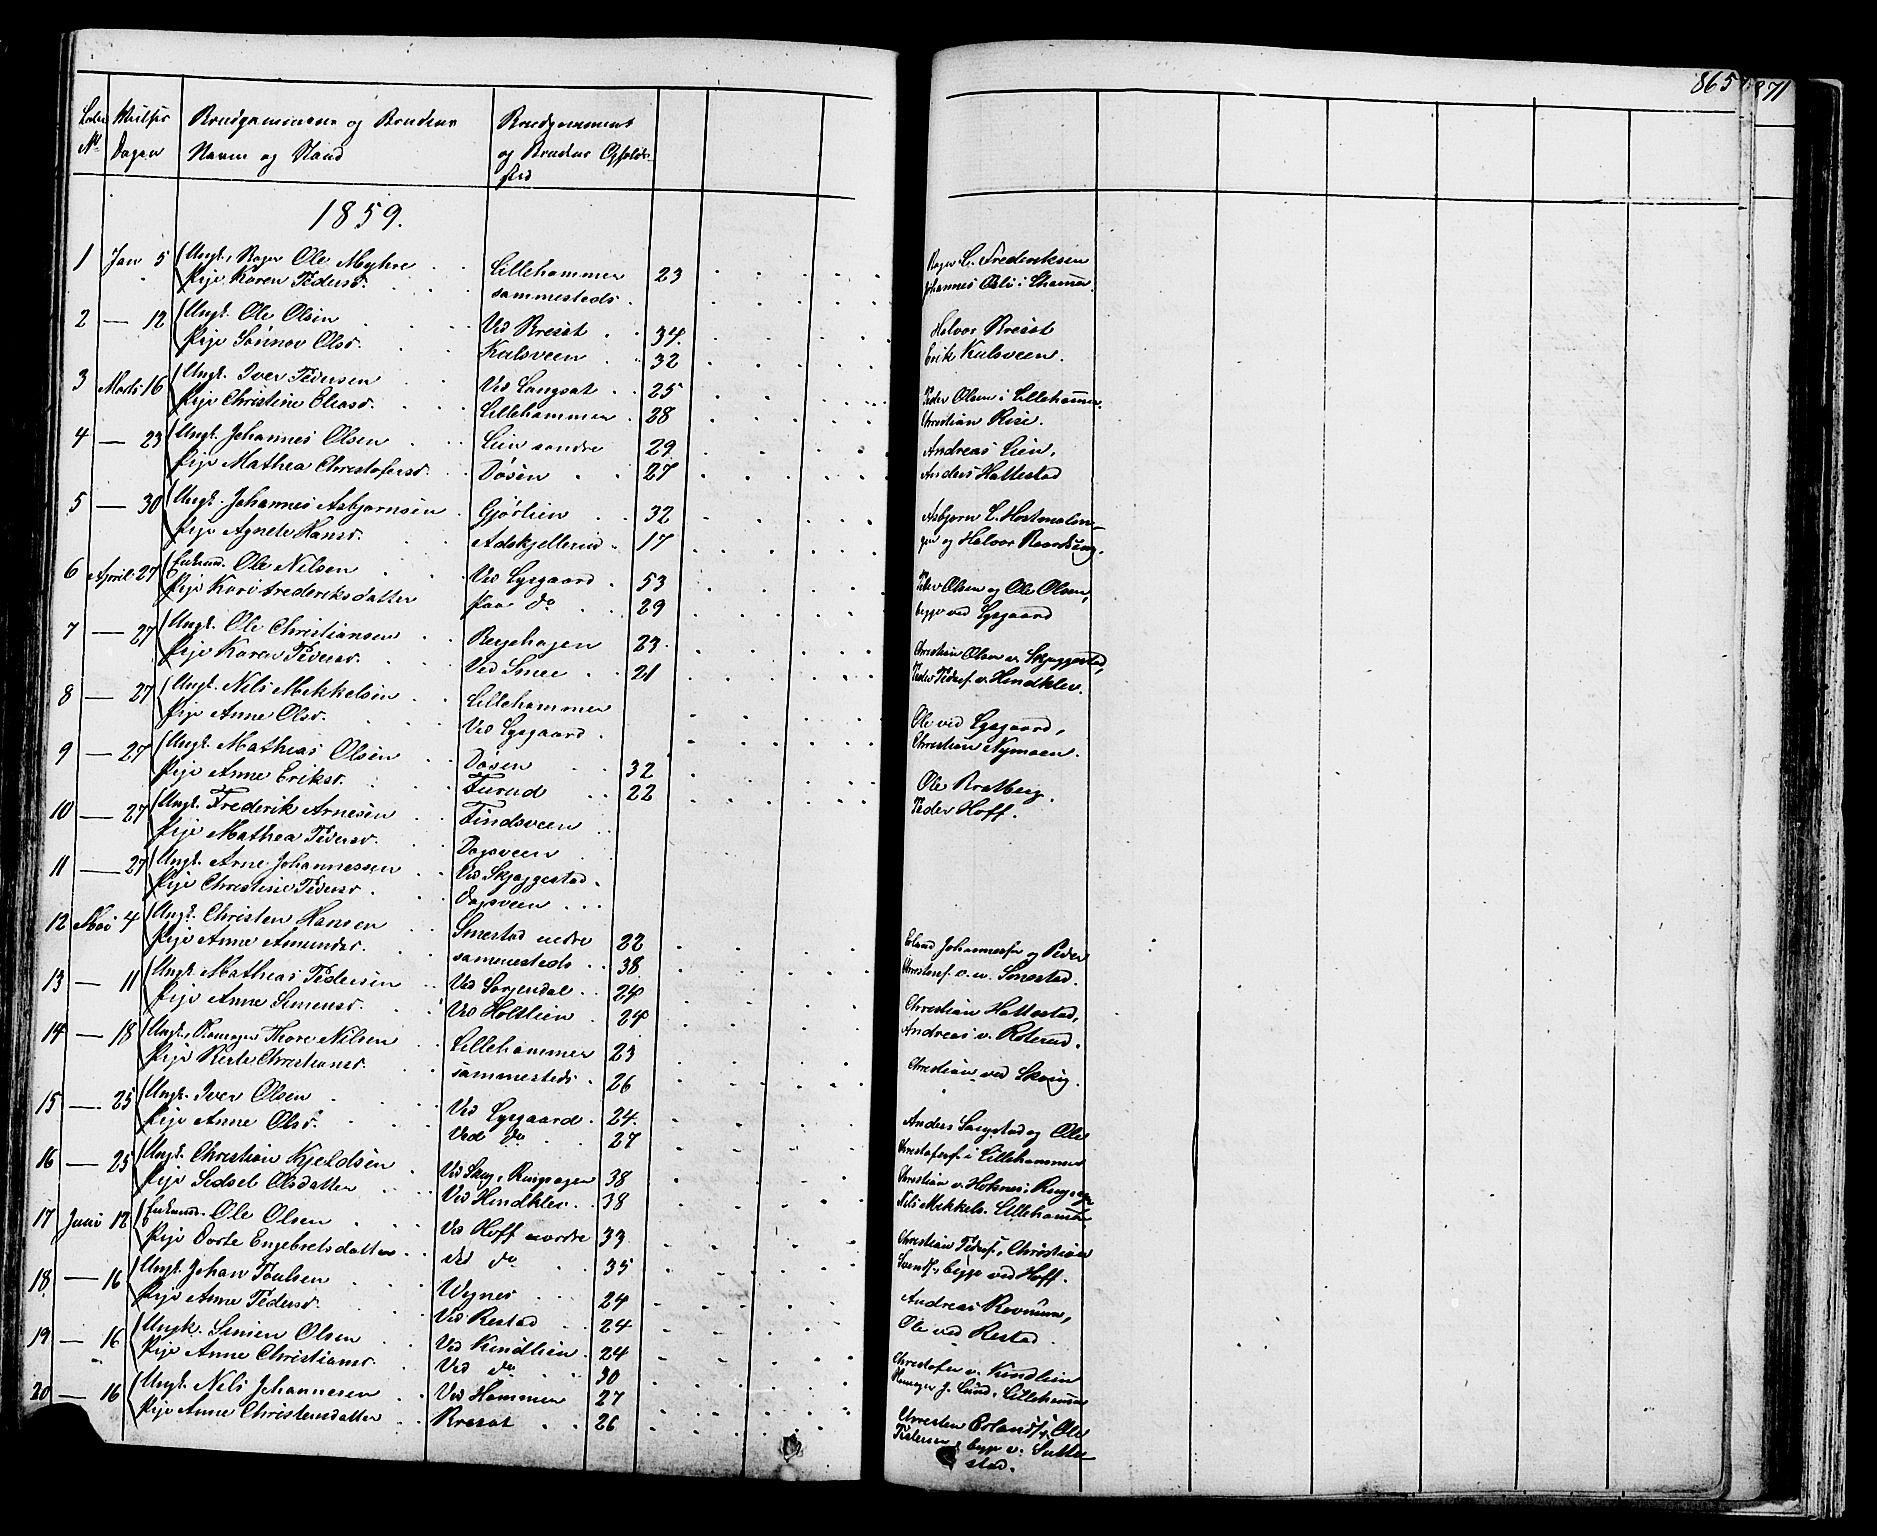 SAH, Fåberg prestekontor, Klokkerbok nr. 7, 1856-1891, s. 864-865